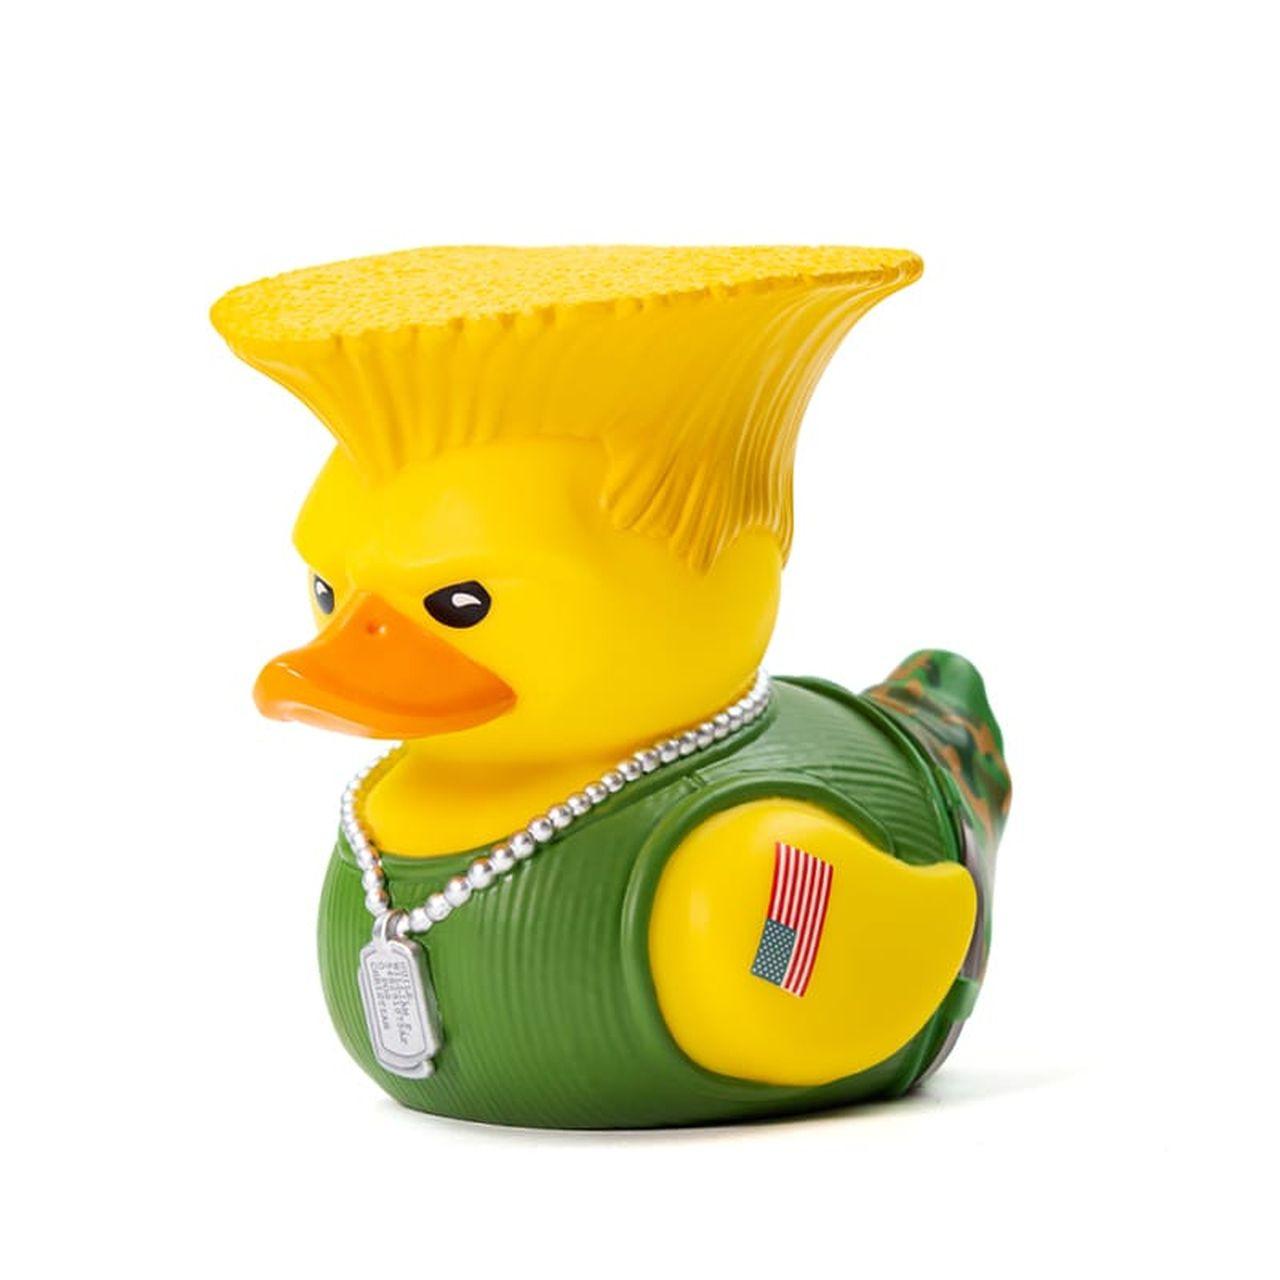 PRÉ VENDA: Tubbz Guile: Street Fighter (Cosplaying Duck Collectible) Patinho Colecionável